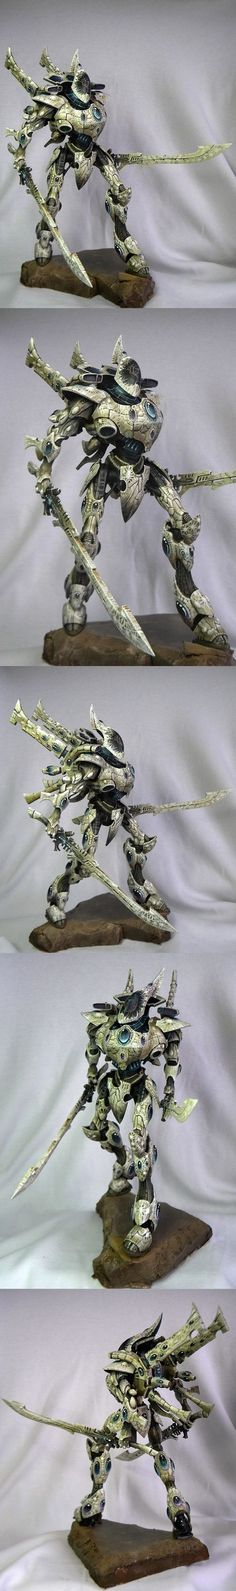 Eldar Wraithknight №2